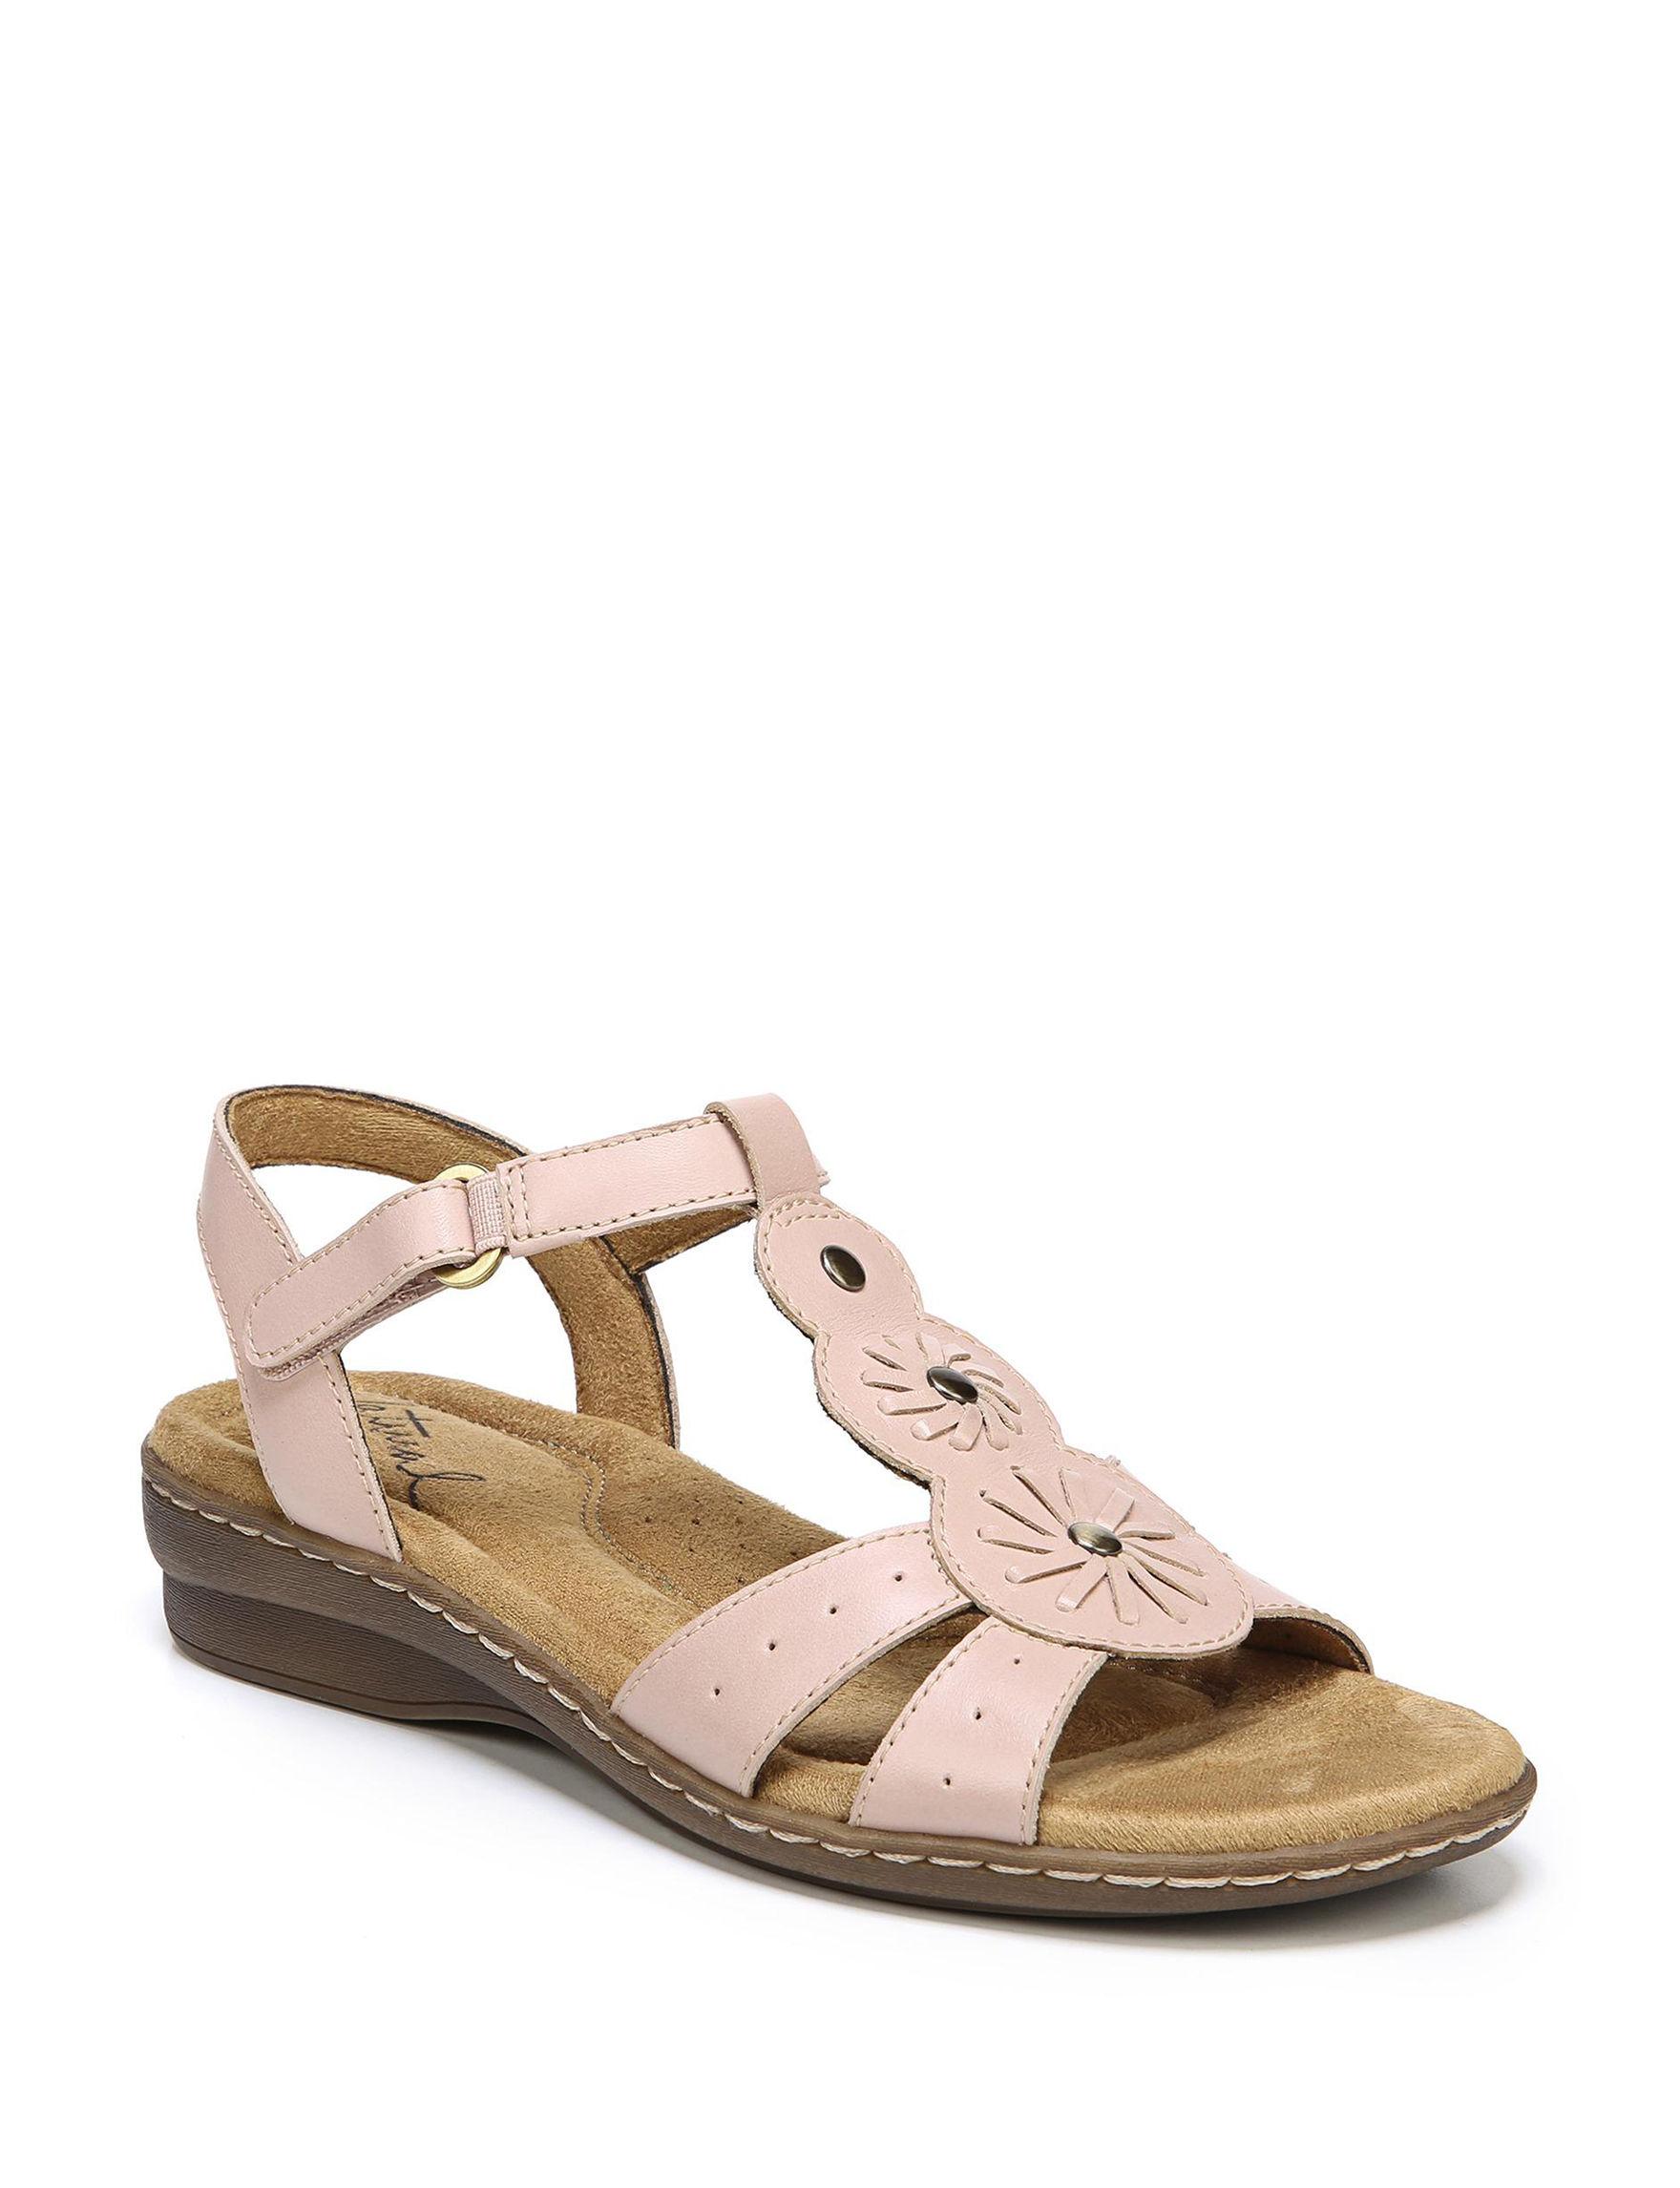 Natural Soul Pink Flat Sandals Comfort